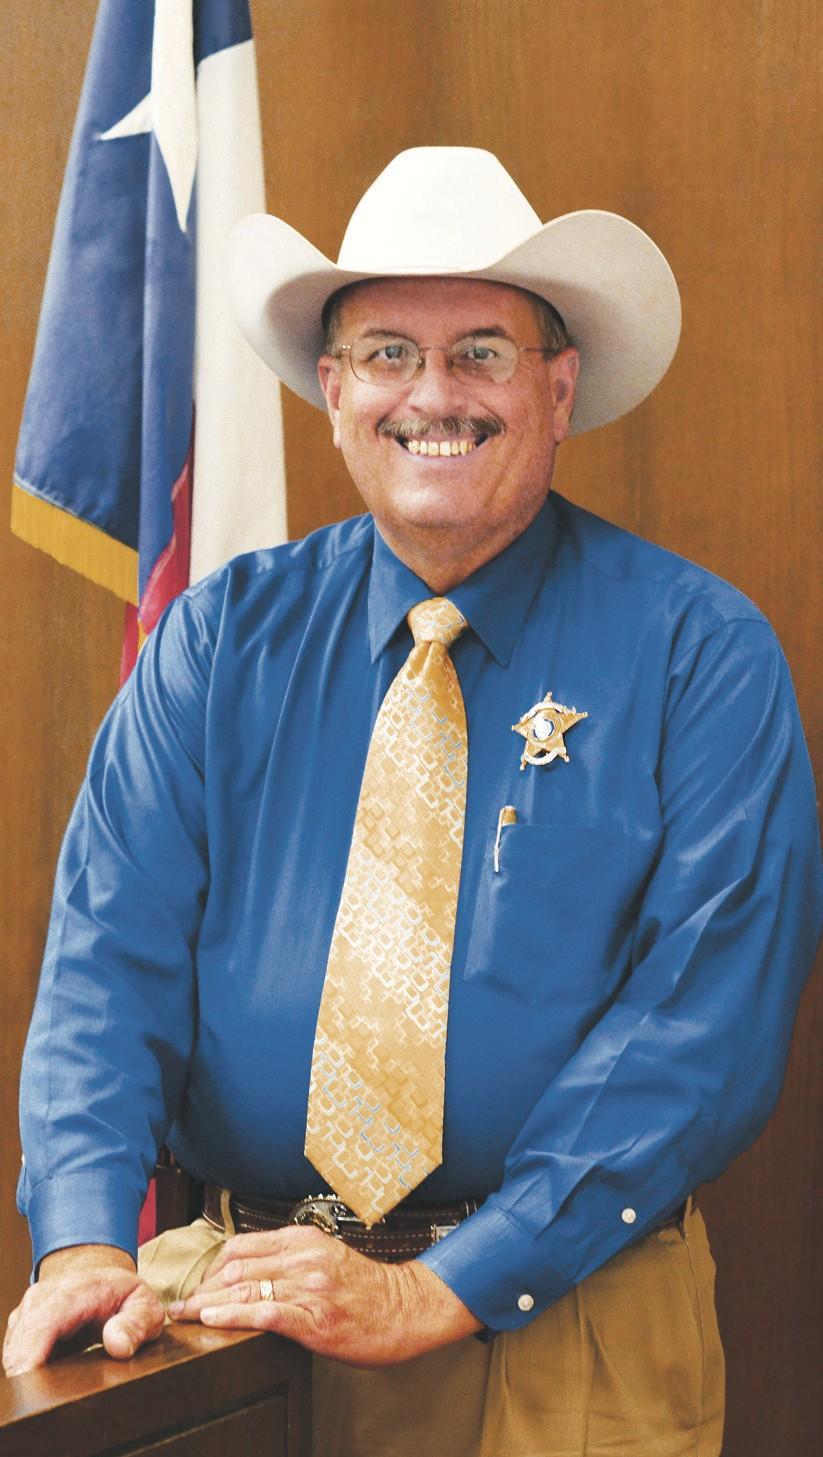 ATASCOSA CO. SHERIFF DAVID SOWARD